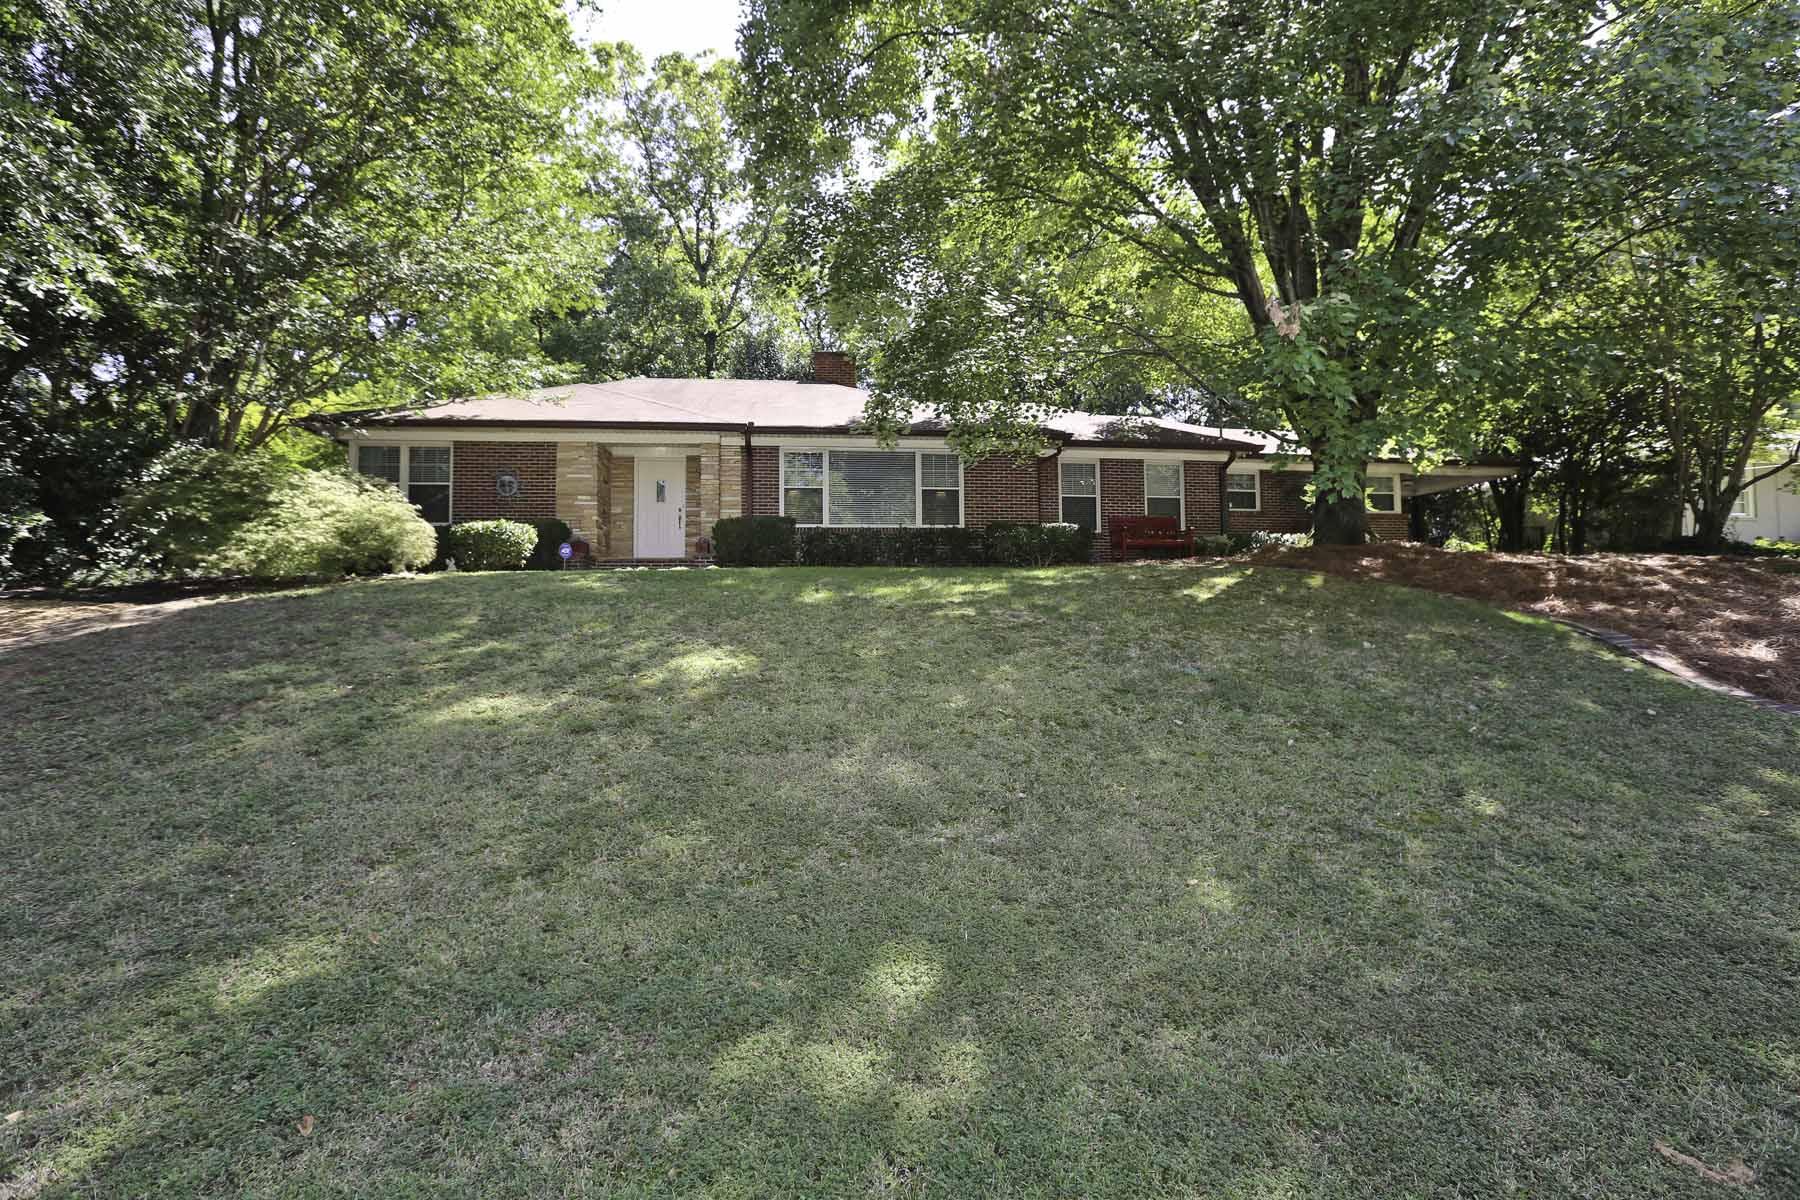 Vivienda unifamiliar por un Venta en Stunning Private Sherwood Home 1631 Doncaster Drive Sherwood Forest, Atlanta, Georgia, 30309 Estados Unidos